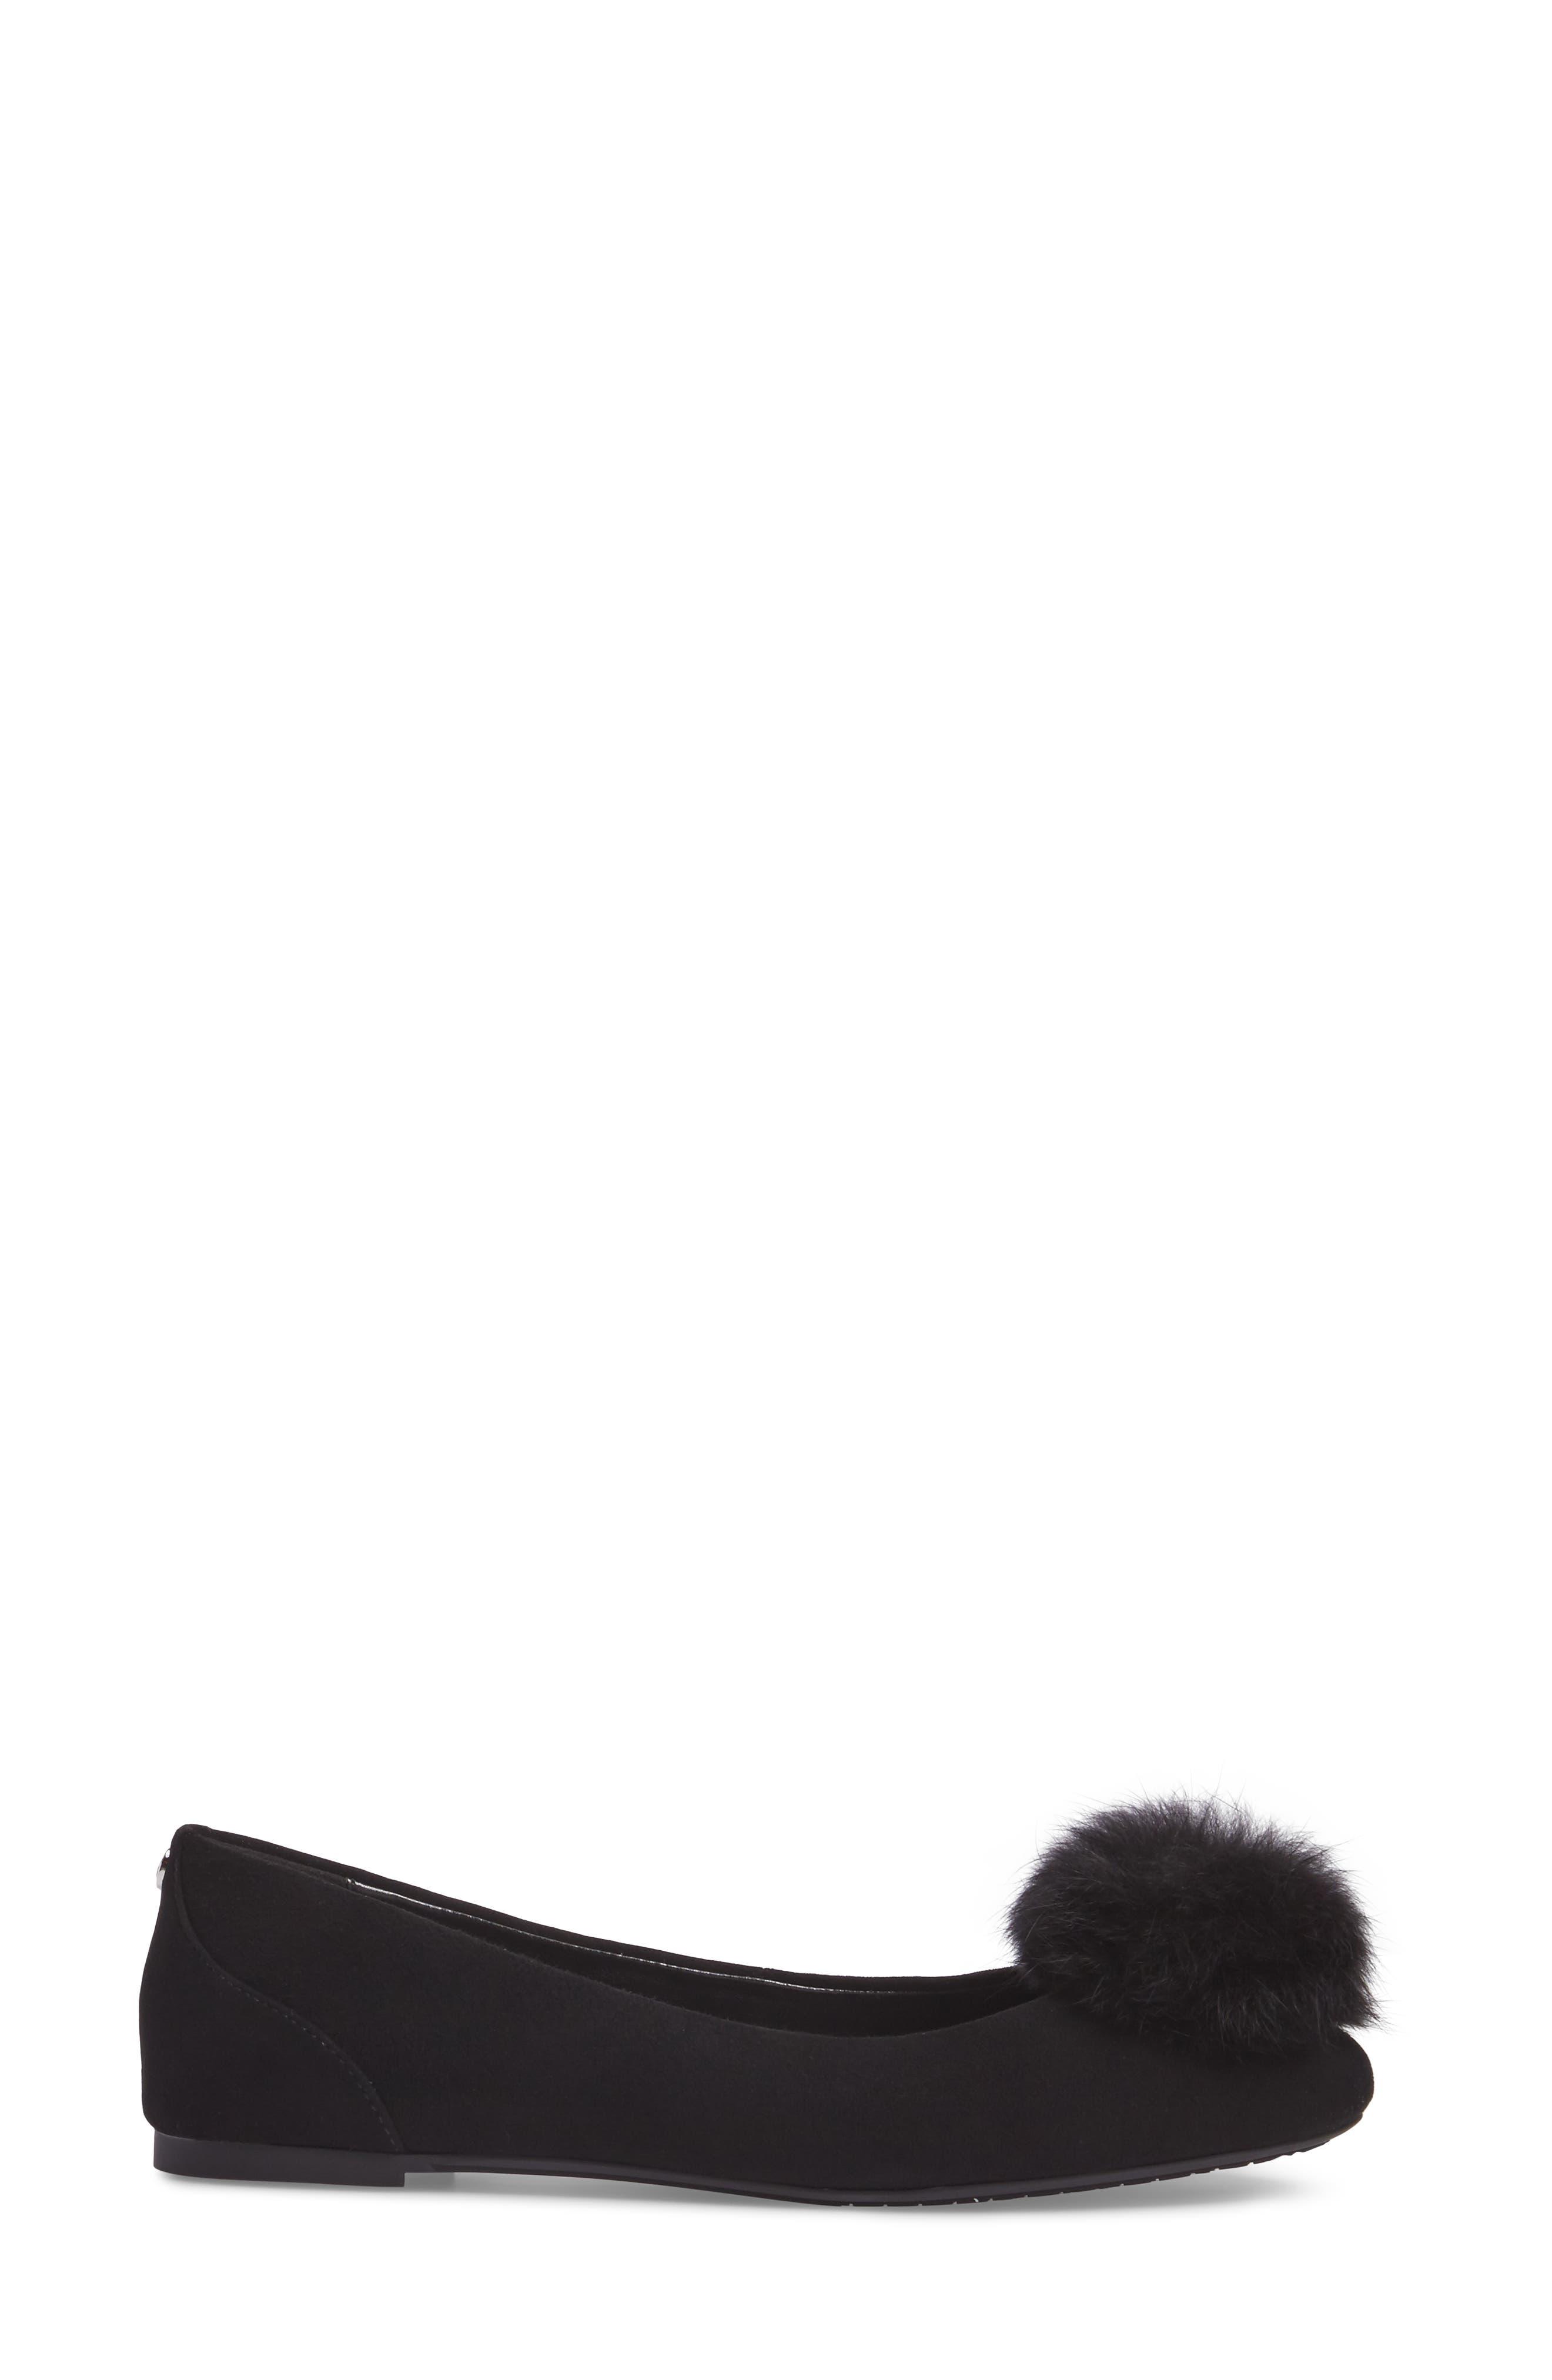 Remi Ballet Flat with Genuine Rabbit Fur Pom,                             Alternate thumbnail 3, color,                             Black Suede